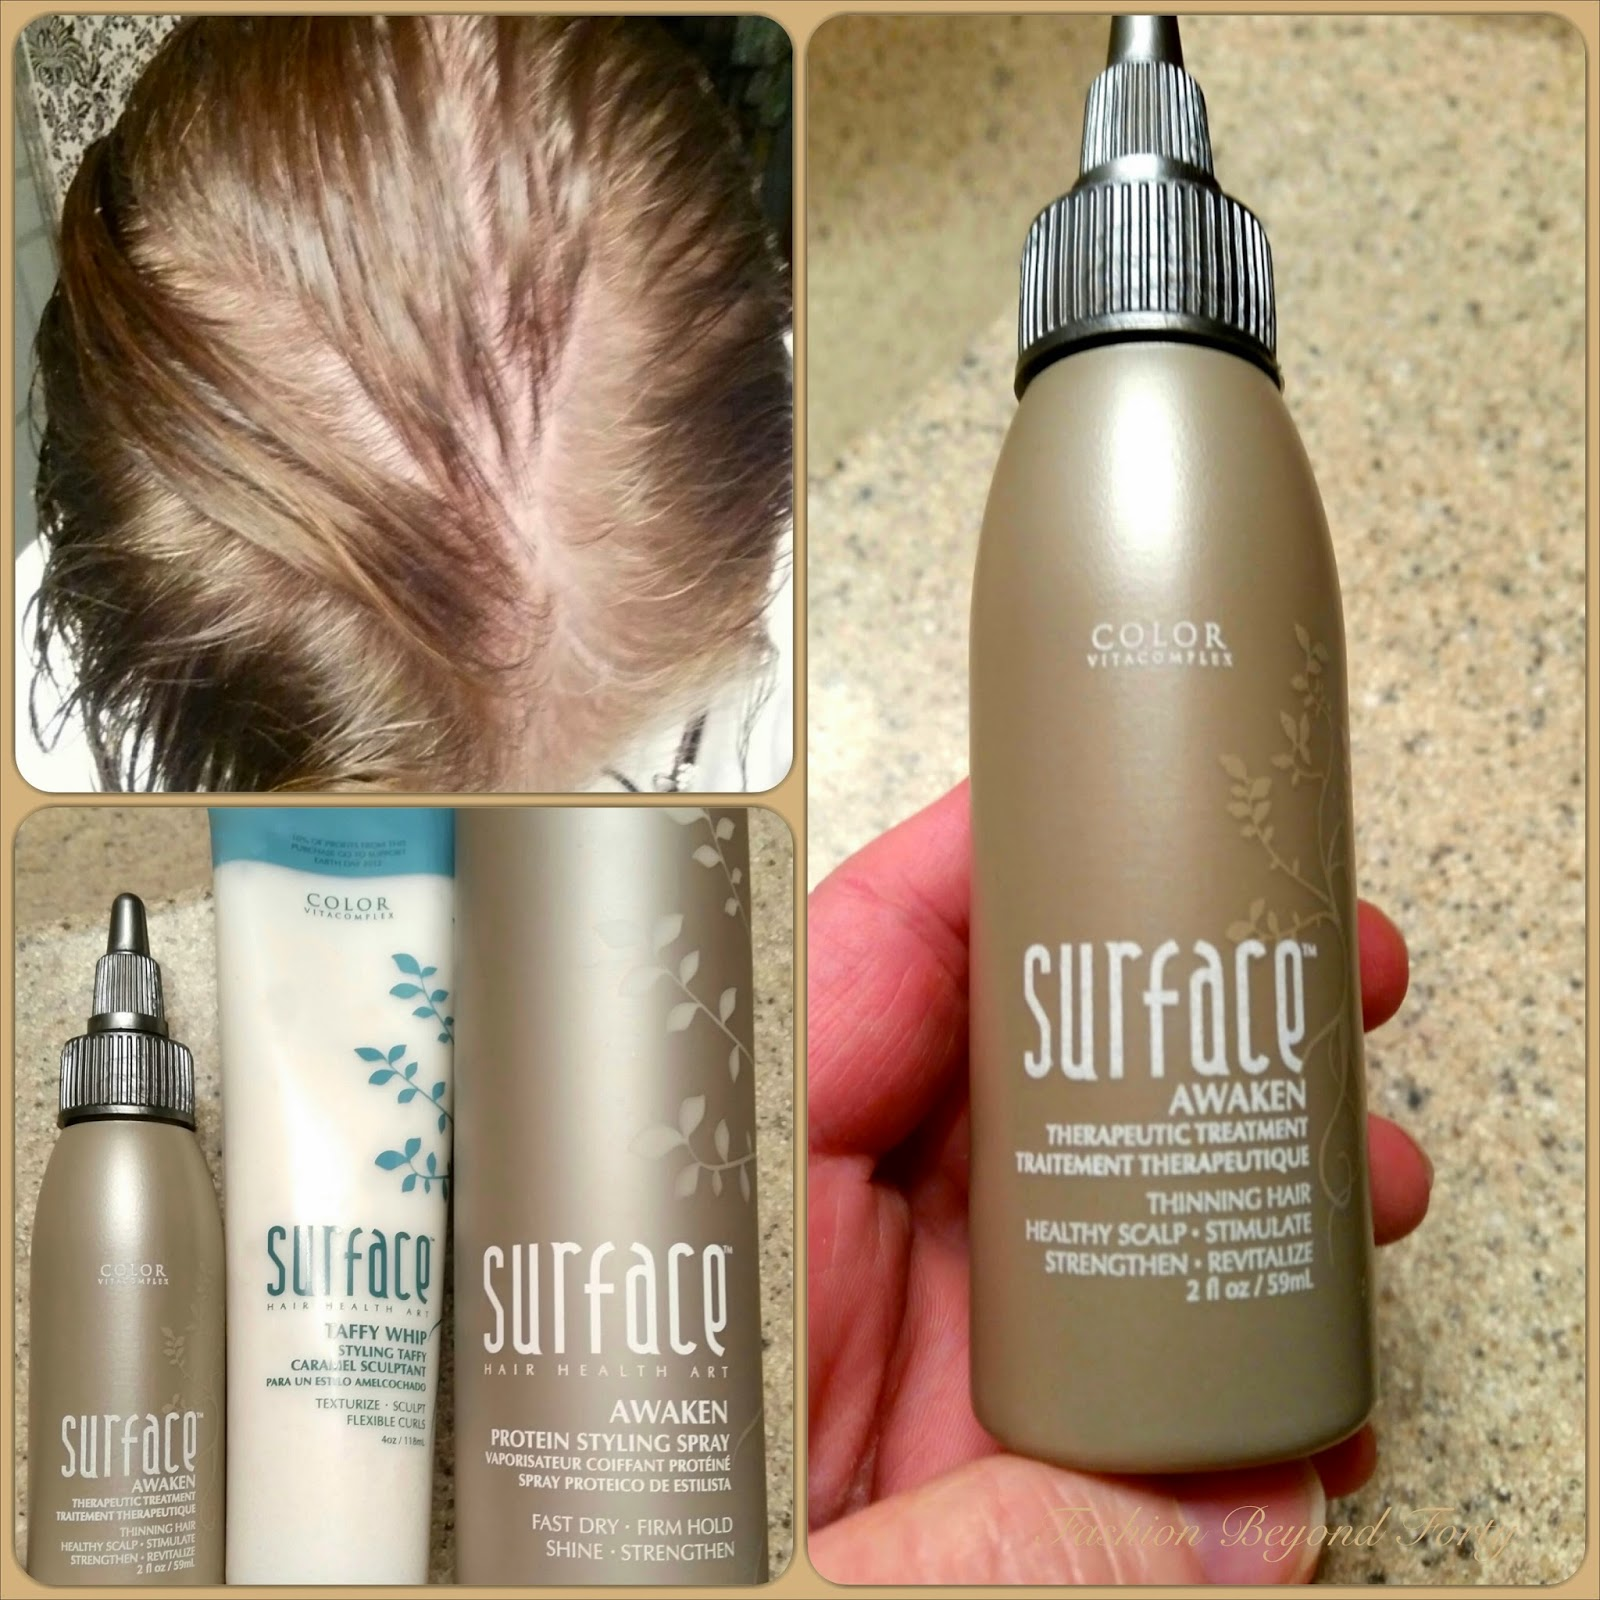 Surface Awaken Therapeutic Treatment